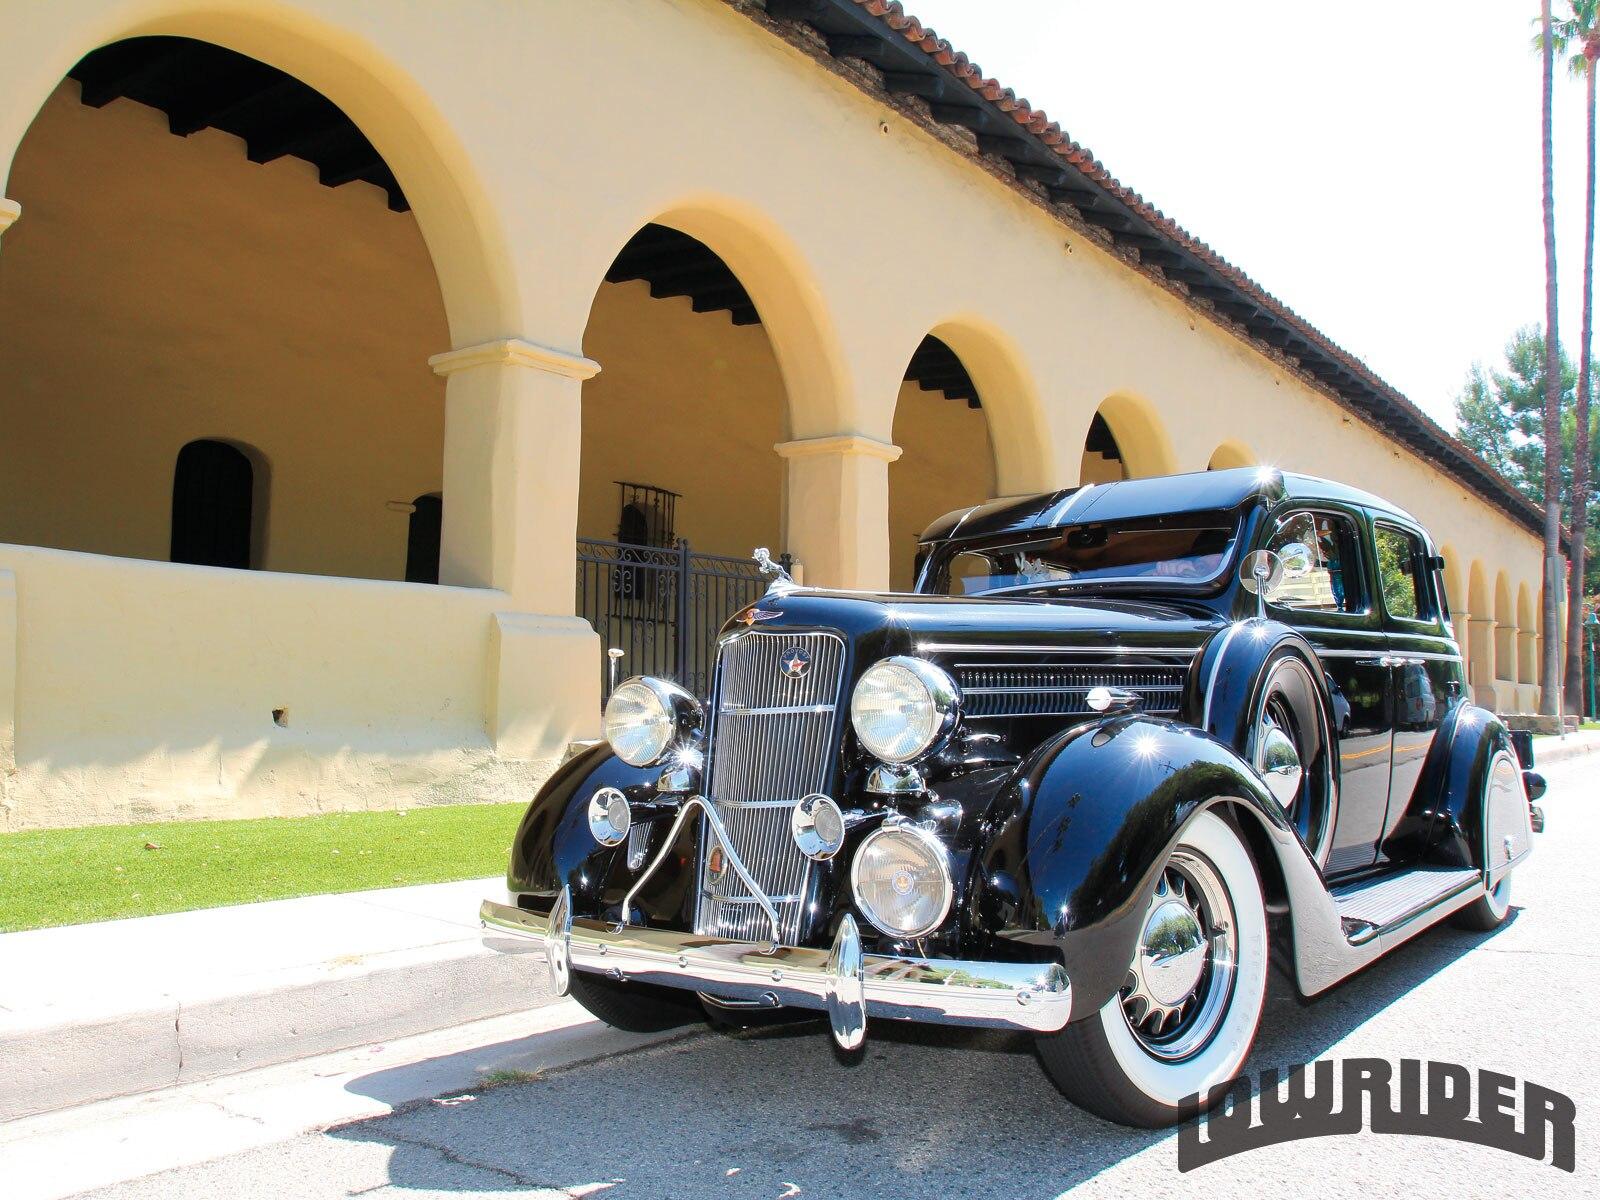 1212-lrmp-01-o-1935-dodge-touring-sedan-driver-side-front-view1